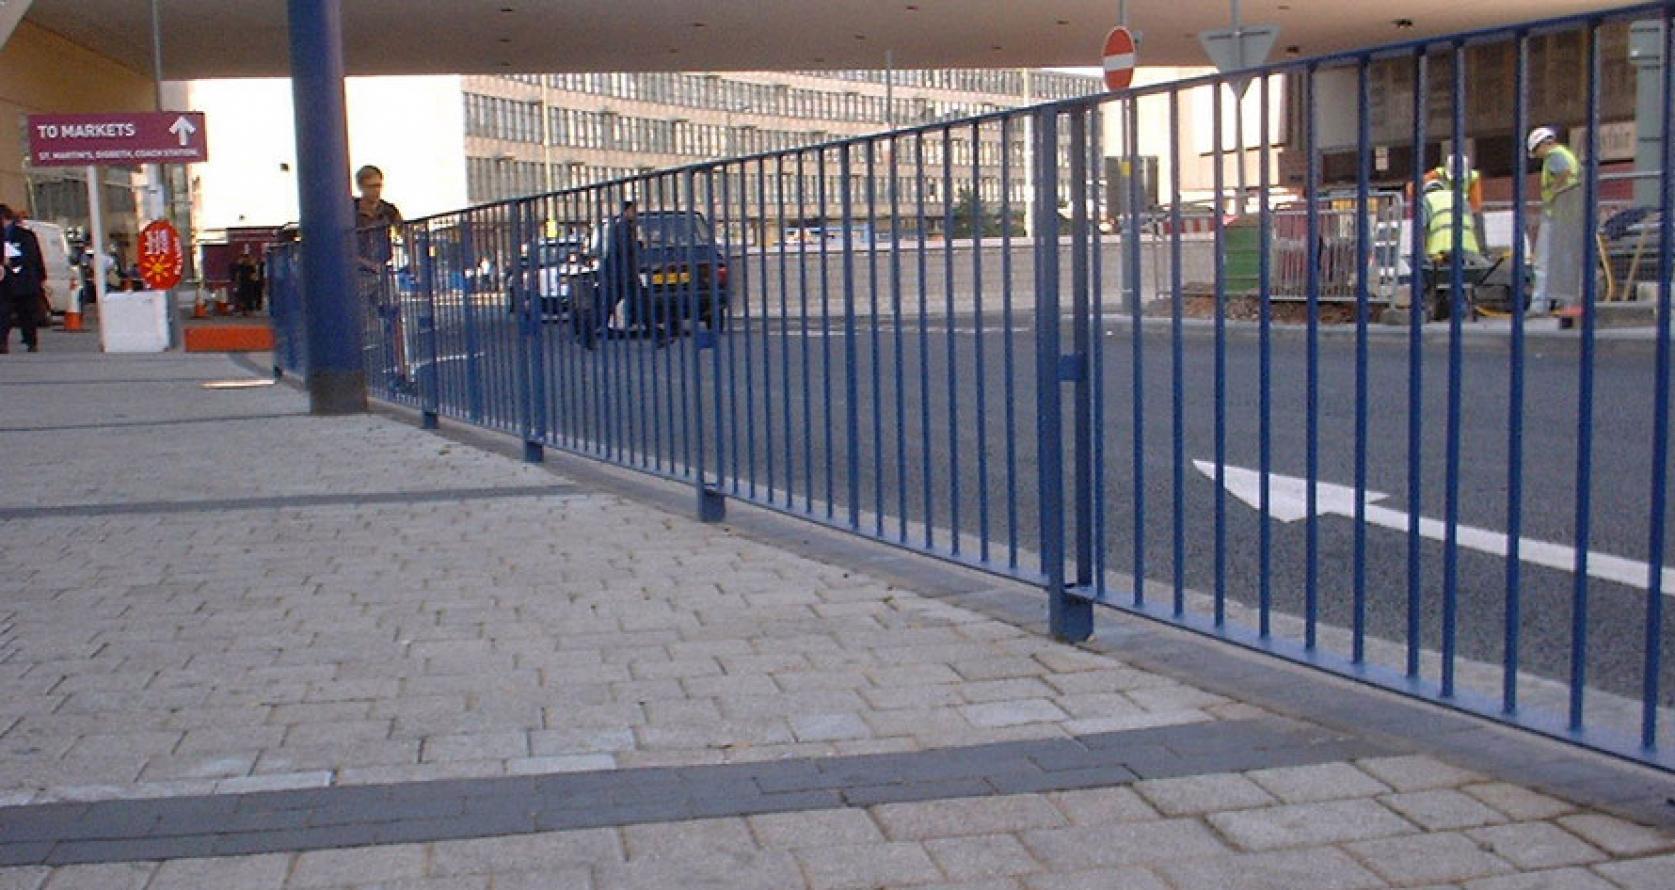 Pedestrian Guard Rail Fencing Midlands Shropshire